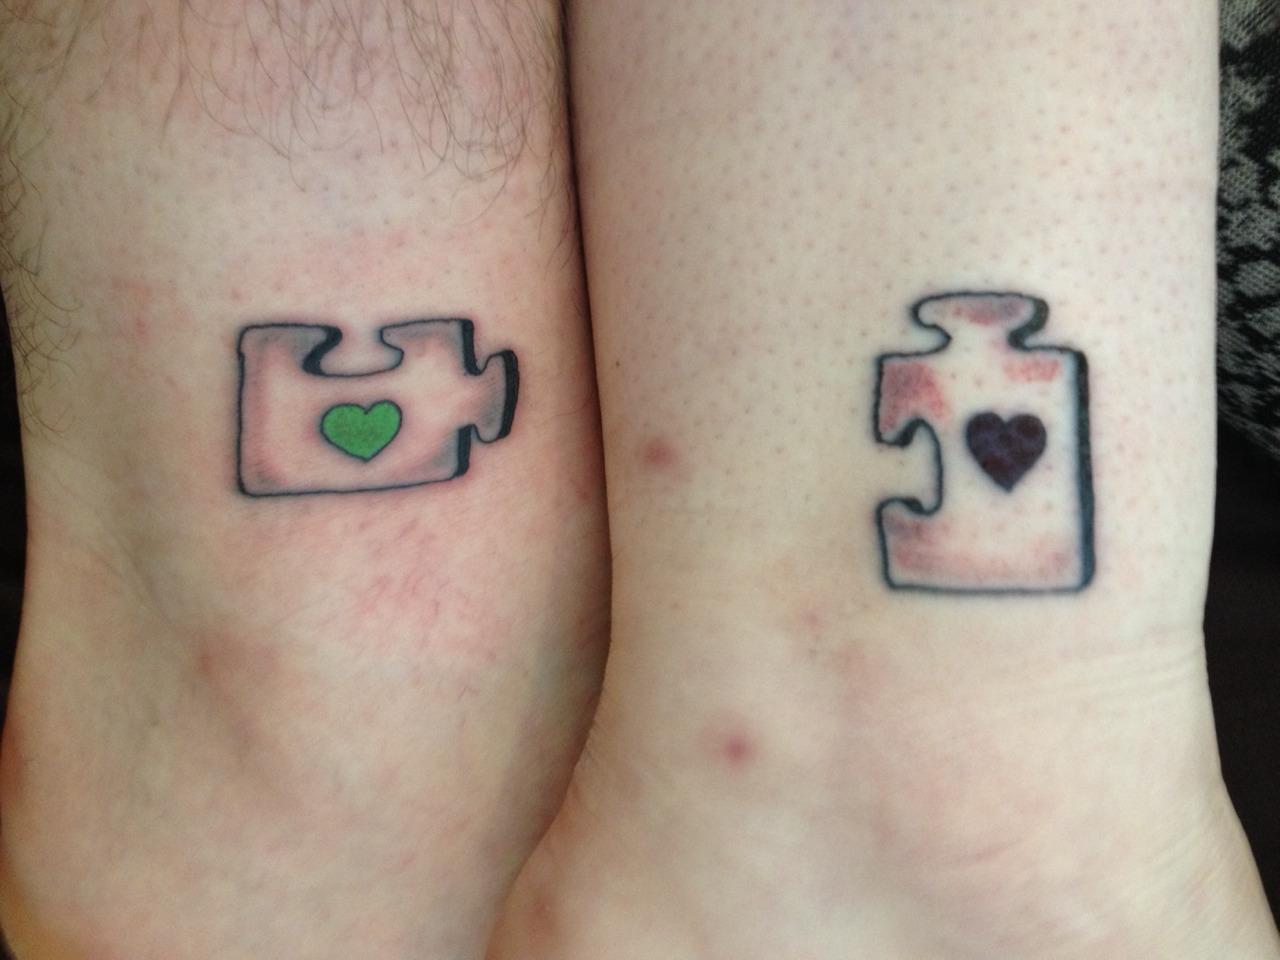 Fabulous 20 Schattige Matching Tattoos Voor Stellen #SG96